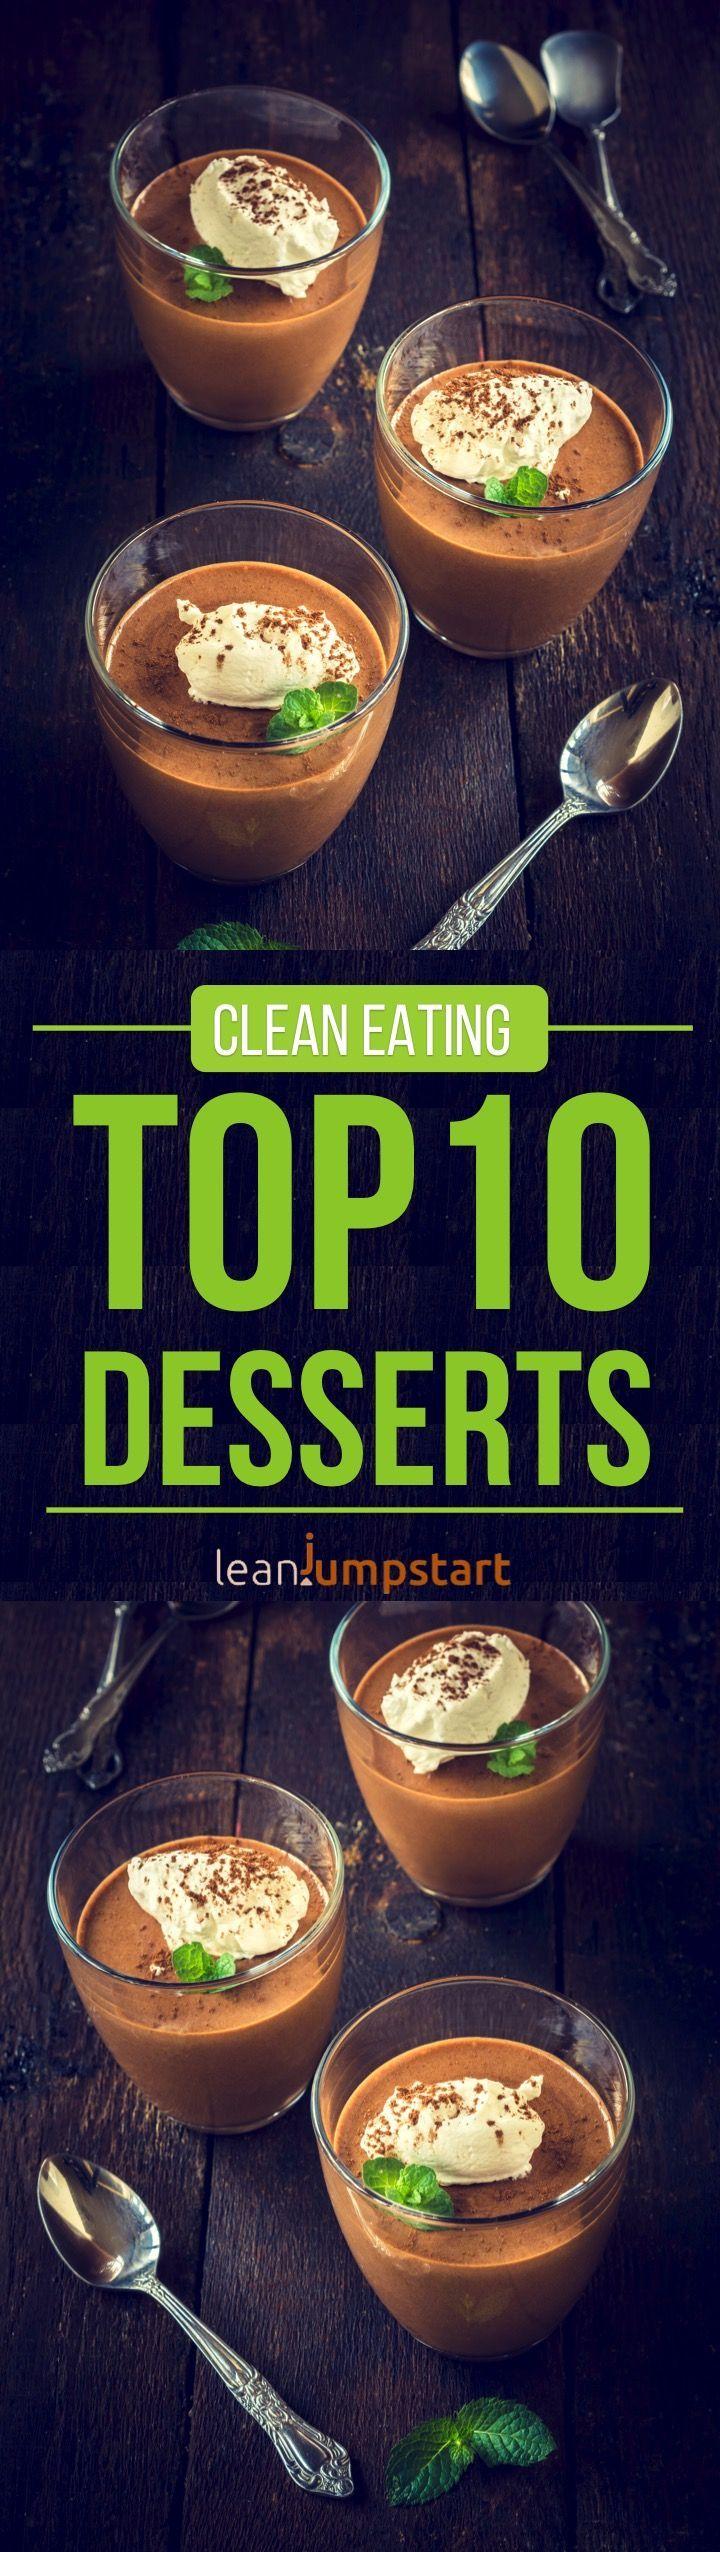 clean eating desserts: Top 10 easiest, lean & delicious dessert recipes #cleaneatingdessert #eatclean #easydessert